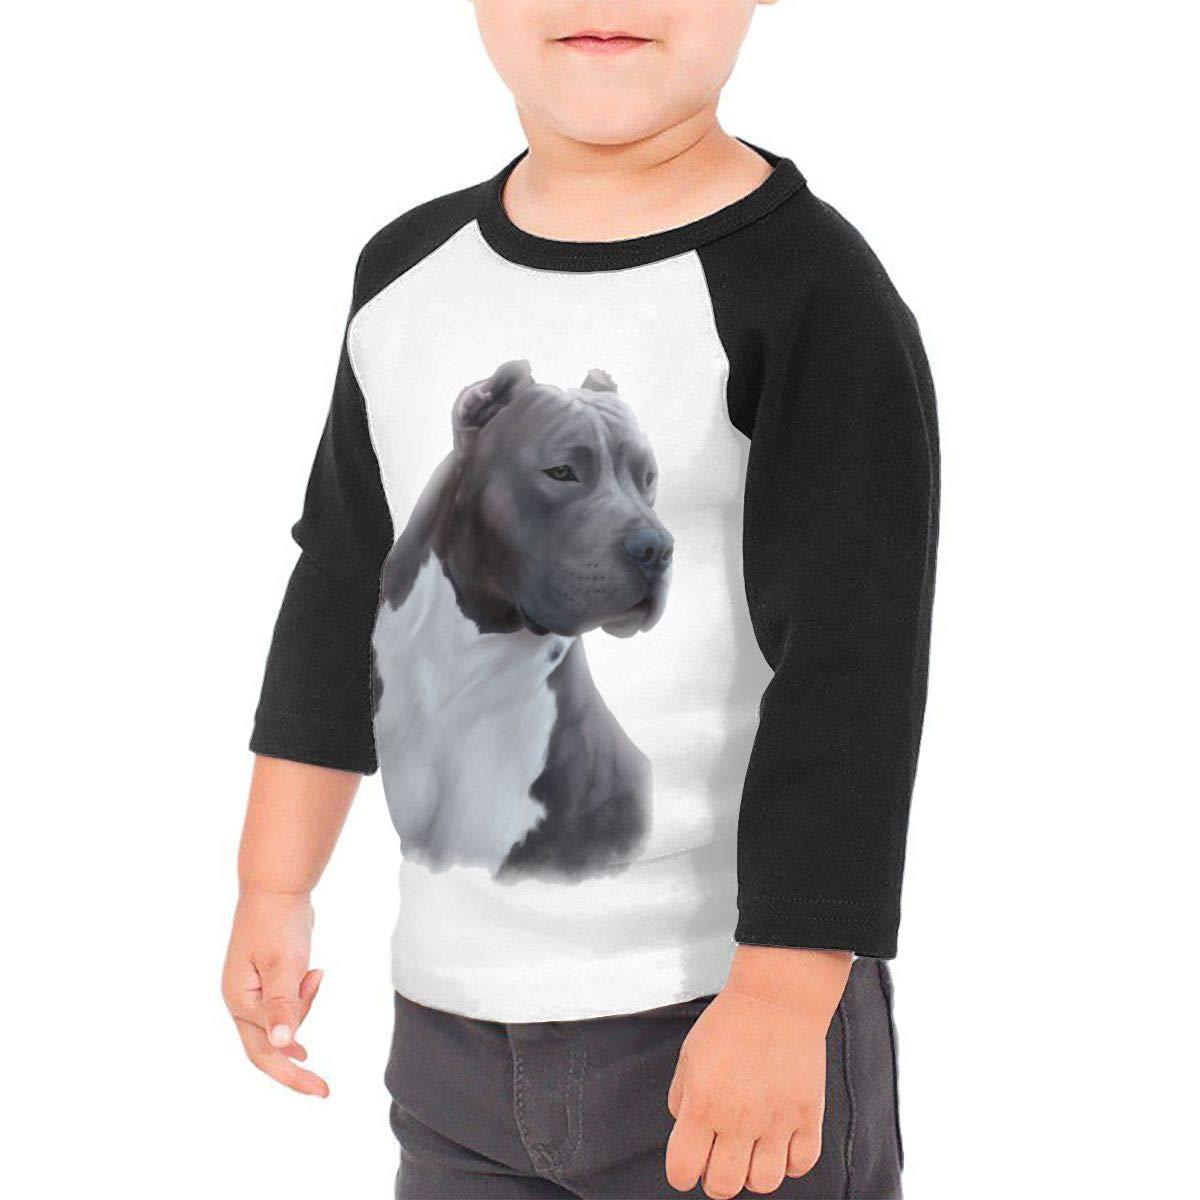 Kocvbng I Grey Pitbull Raglan 3//4 Sleeves Tshirt for Girls Boys